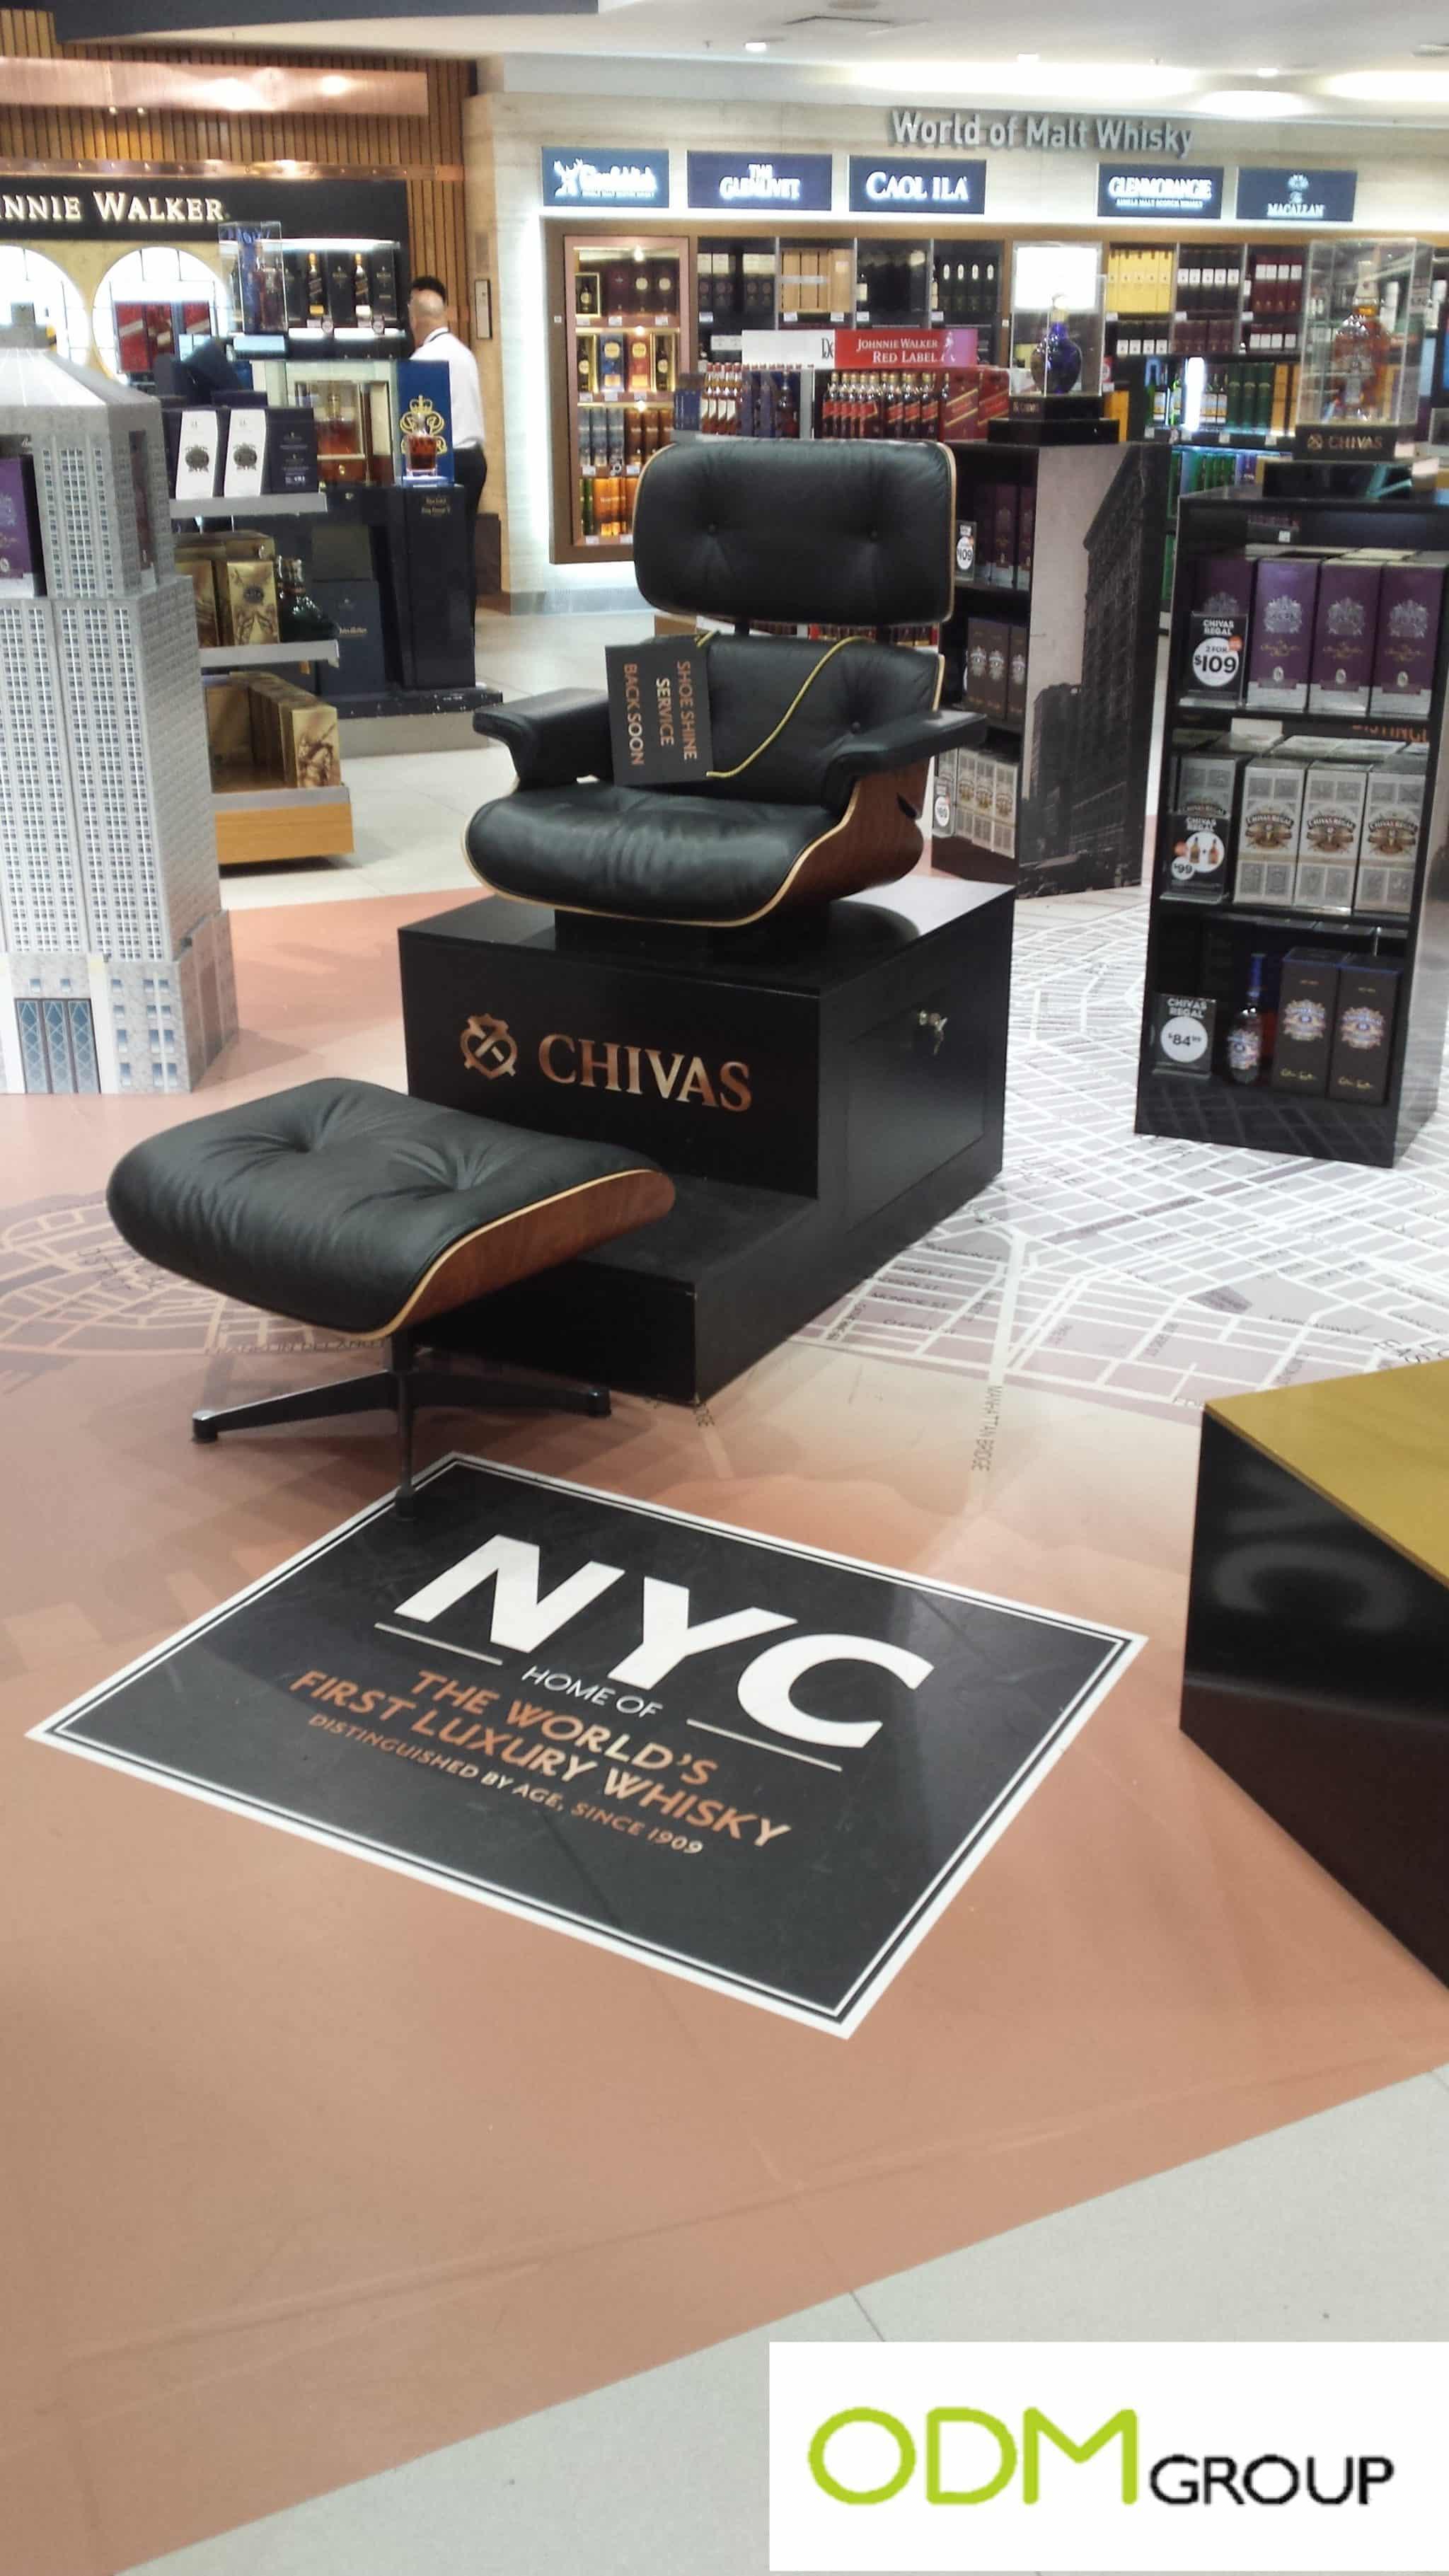 Eye-catching POS display by Chivas